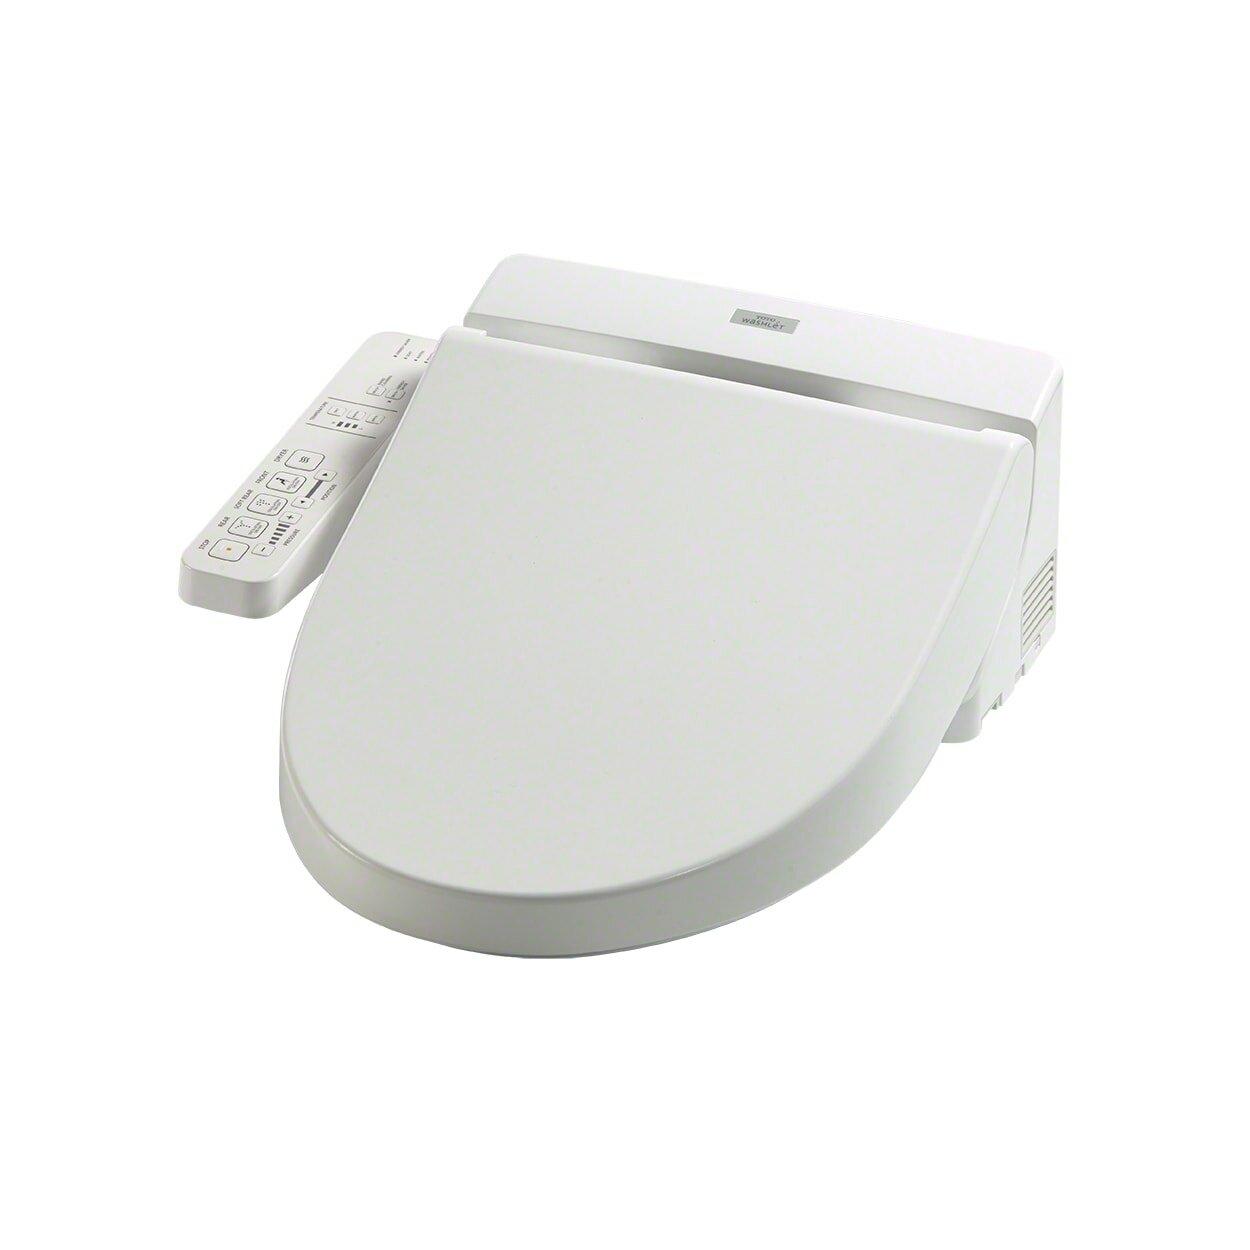 Toto Washlet C100 Toilet Seat Bidet & Reviews | Wayfair.ca